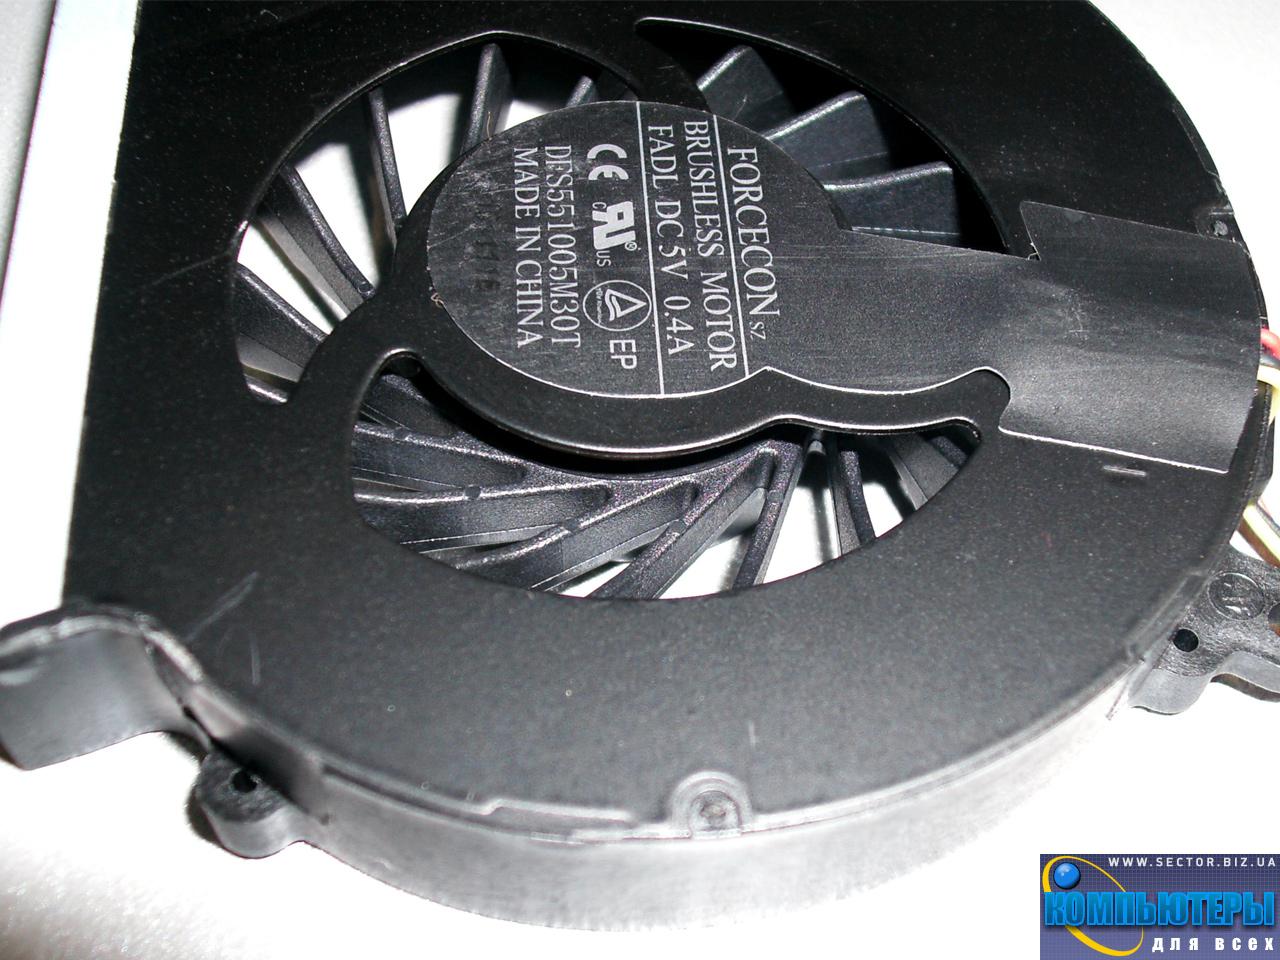 Кулер к ноутбуку HP Compaq CQ43 CQ57 CQ631 CQ635 G57 G43  430 431 435 436 630 p/n: DFS551005M30T FADL. Фото № 3.